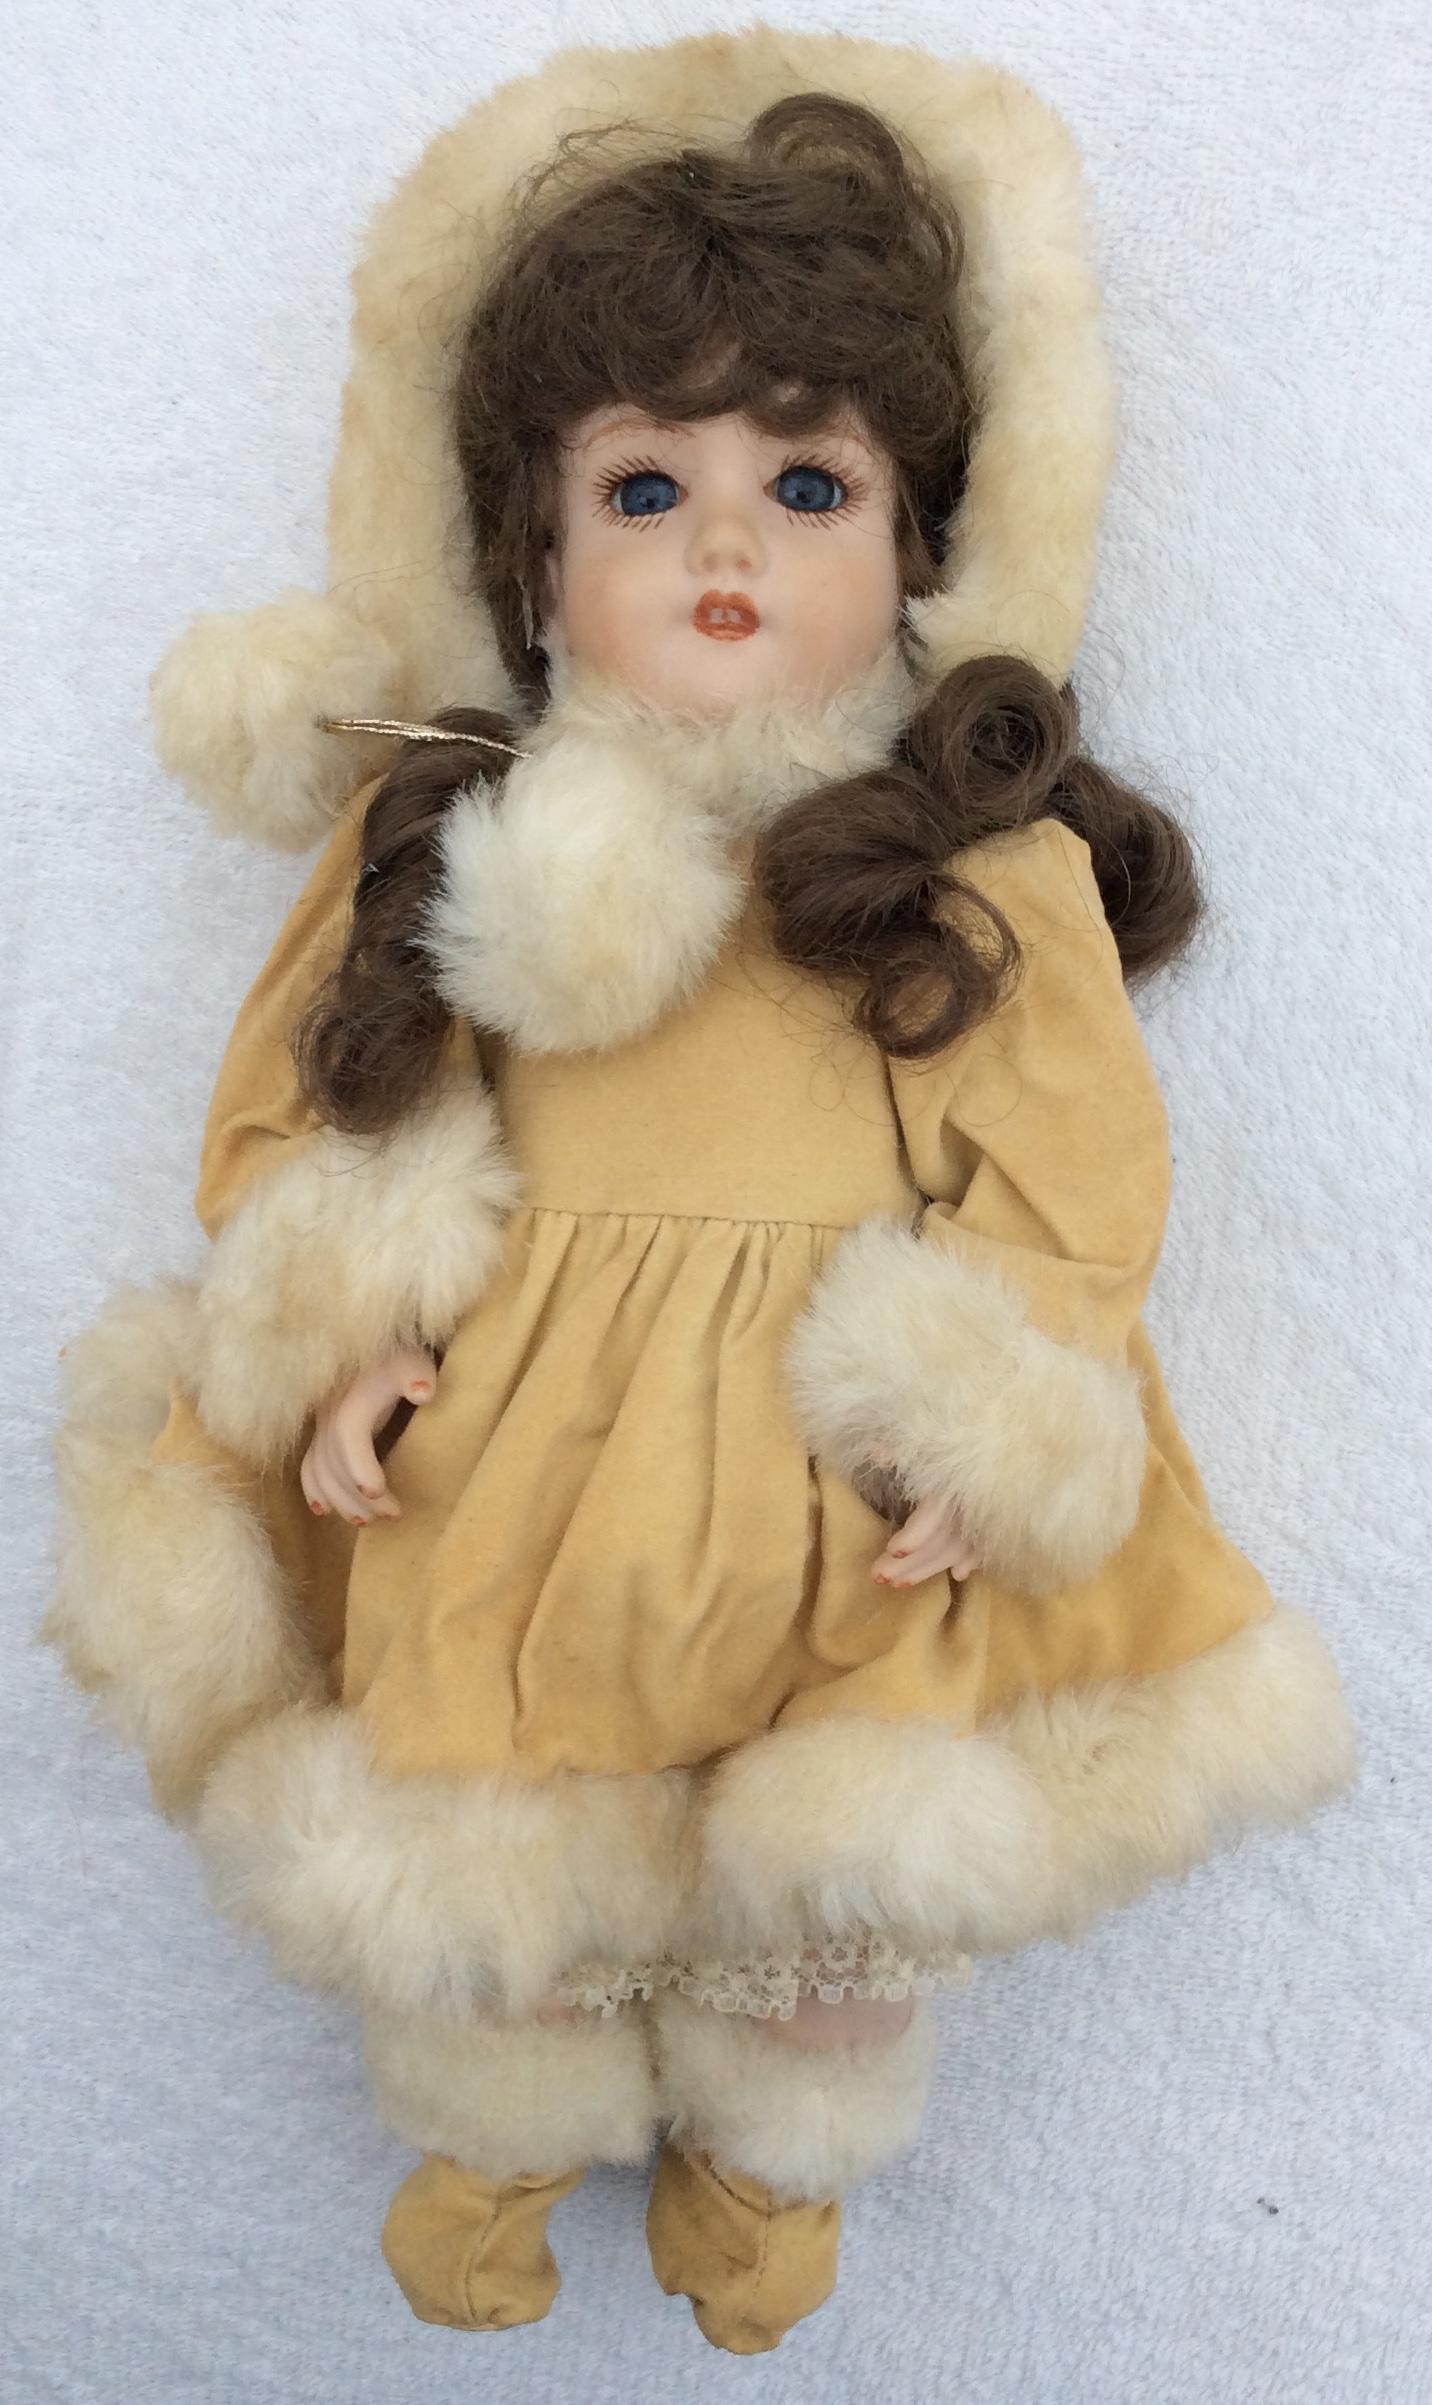 Vintage Collectable handmade porcelain doll 32cms